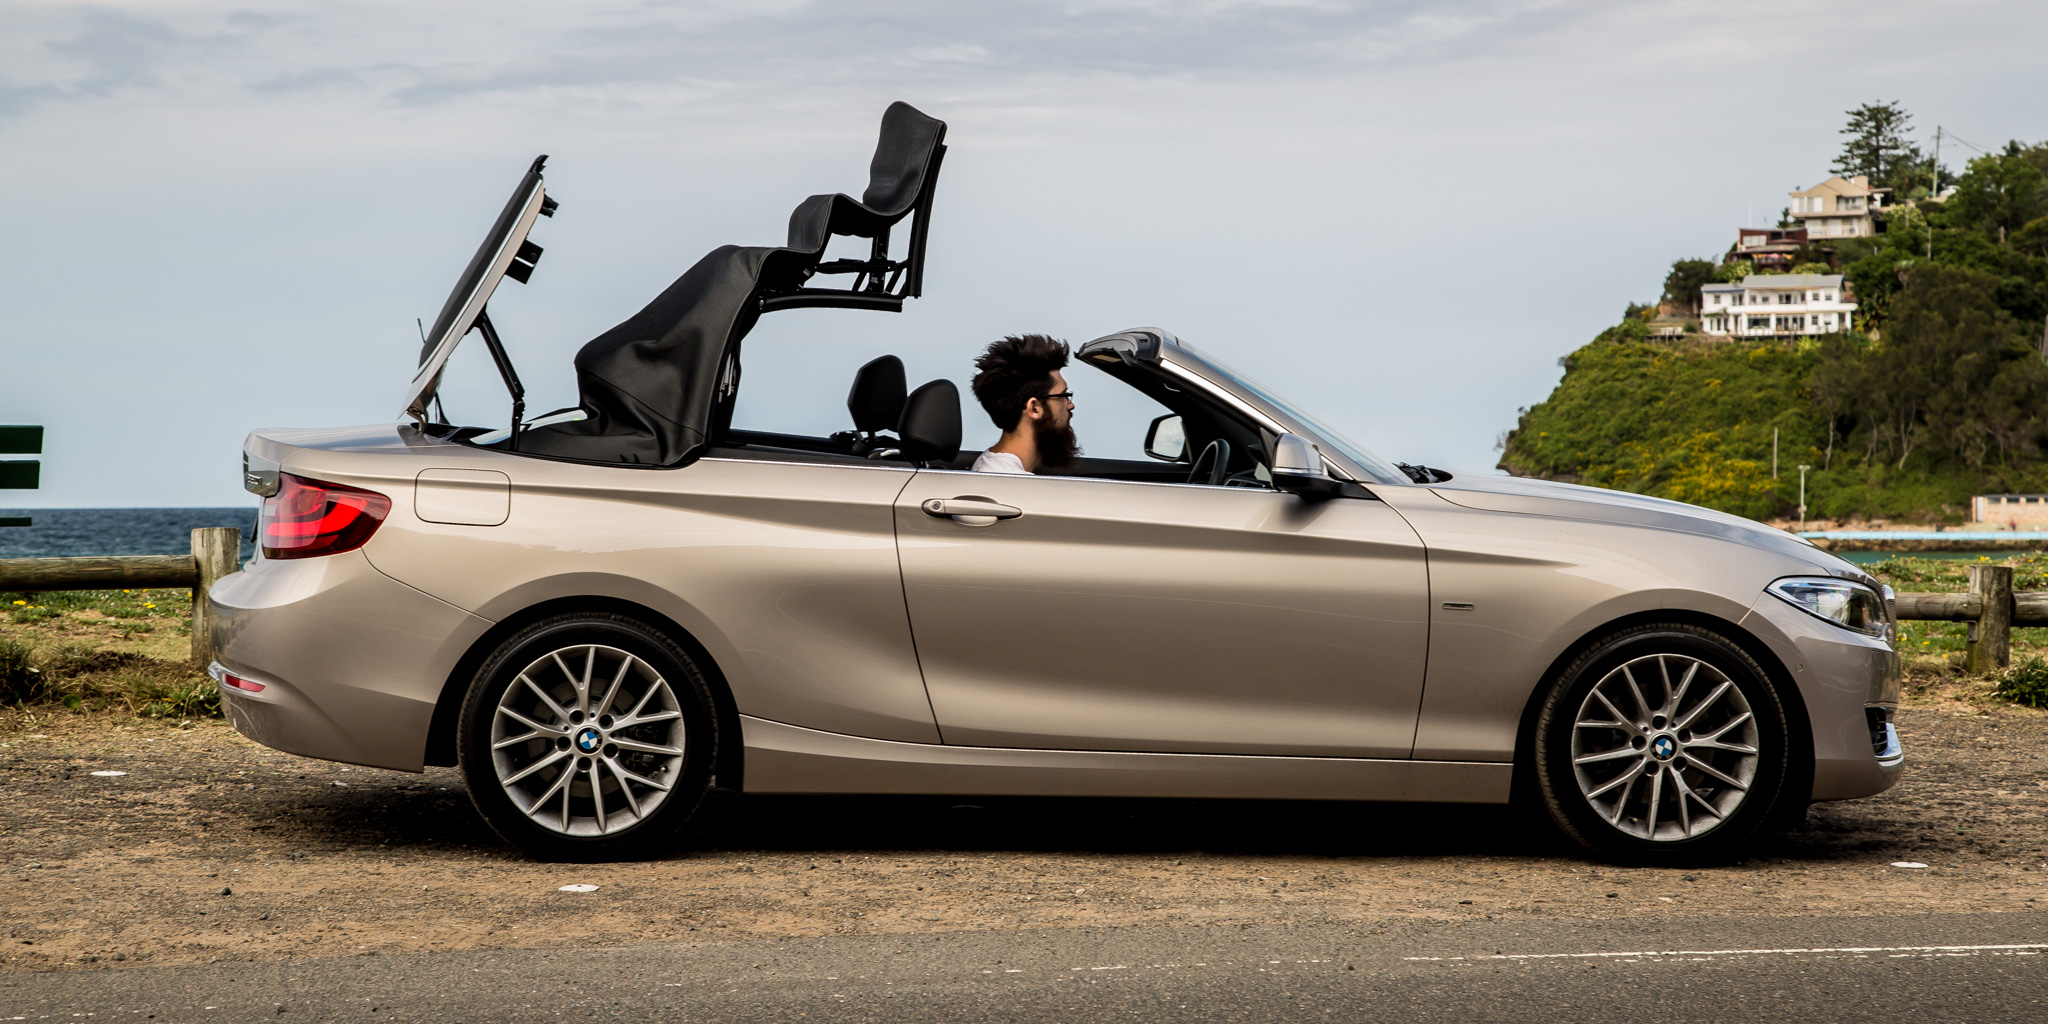 audi a3 cabriolet v bmw 2 series convertible comparison review photos. Black Bedroom Furniture Sets. Home Design Ideas